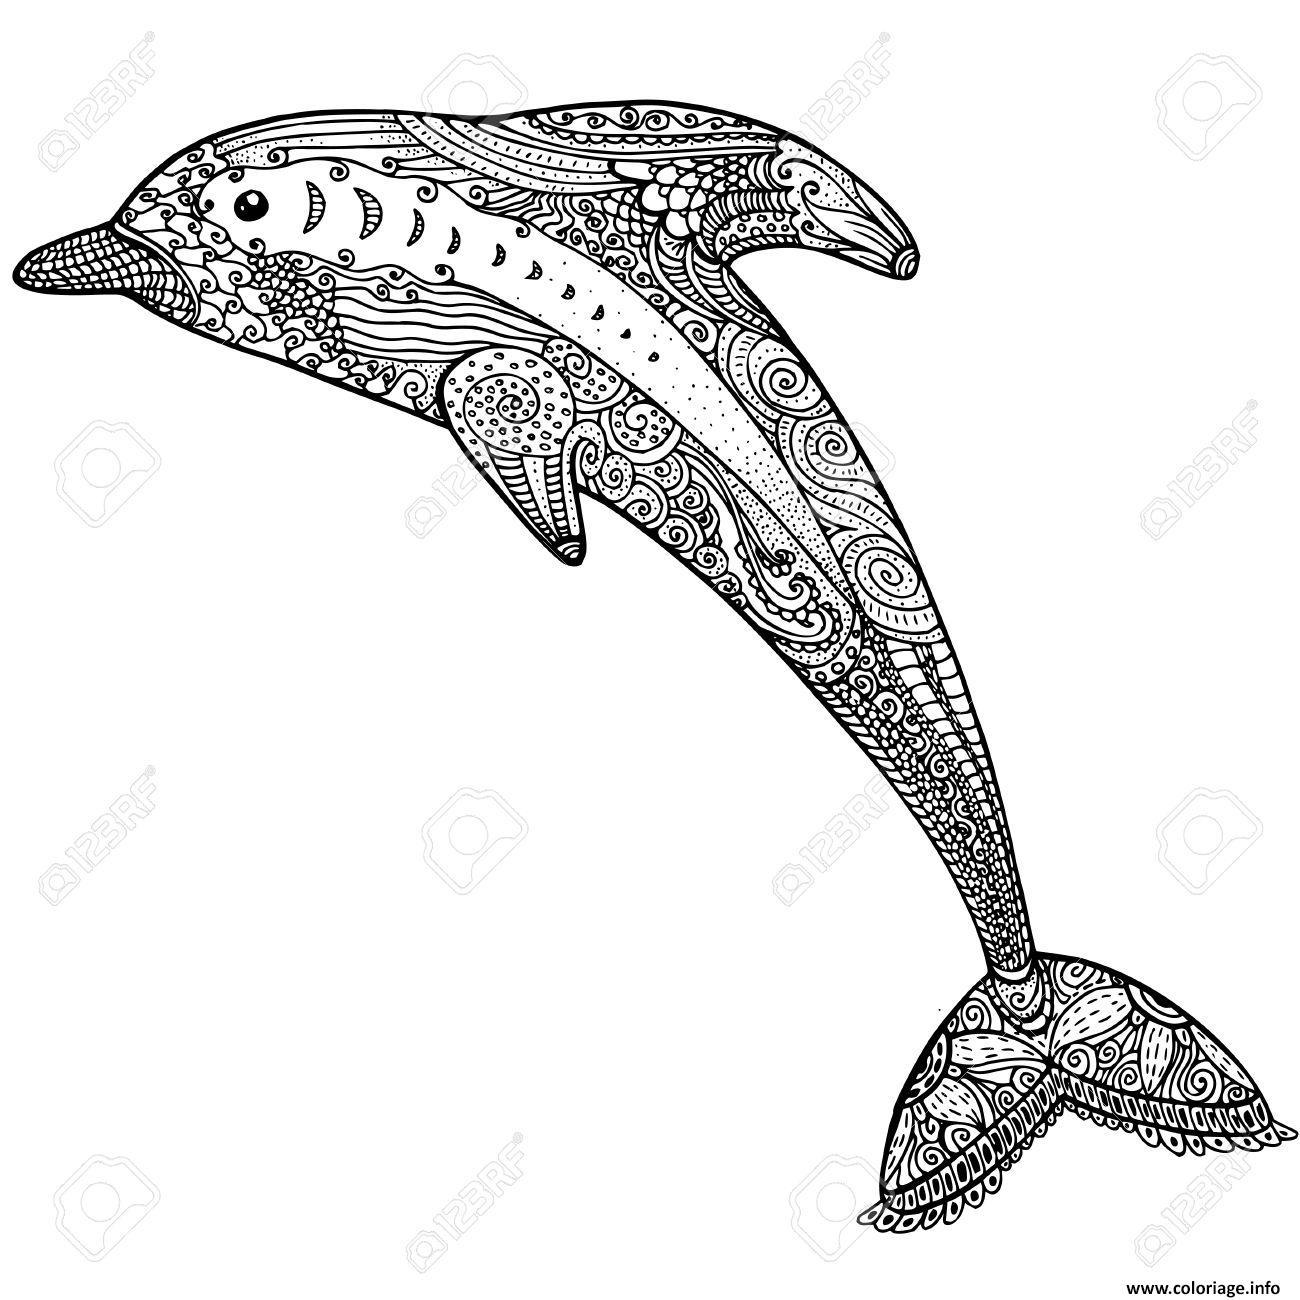 Coloriage dauphin animaux dessin adulte zen difficile dessin - Dauphin a dessiner ...